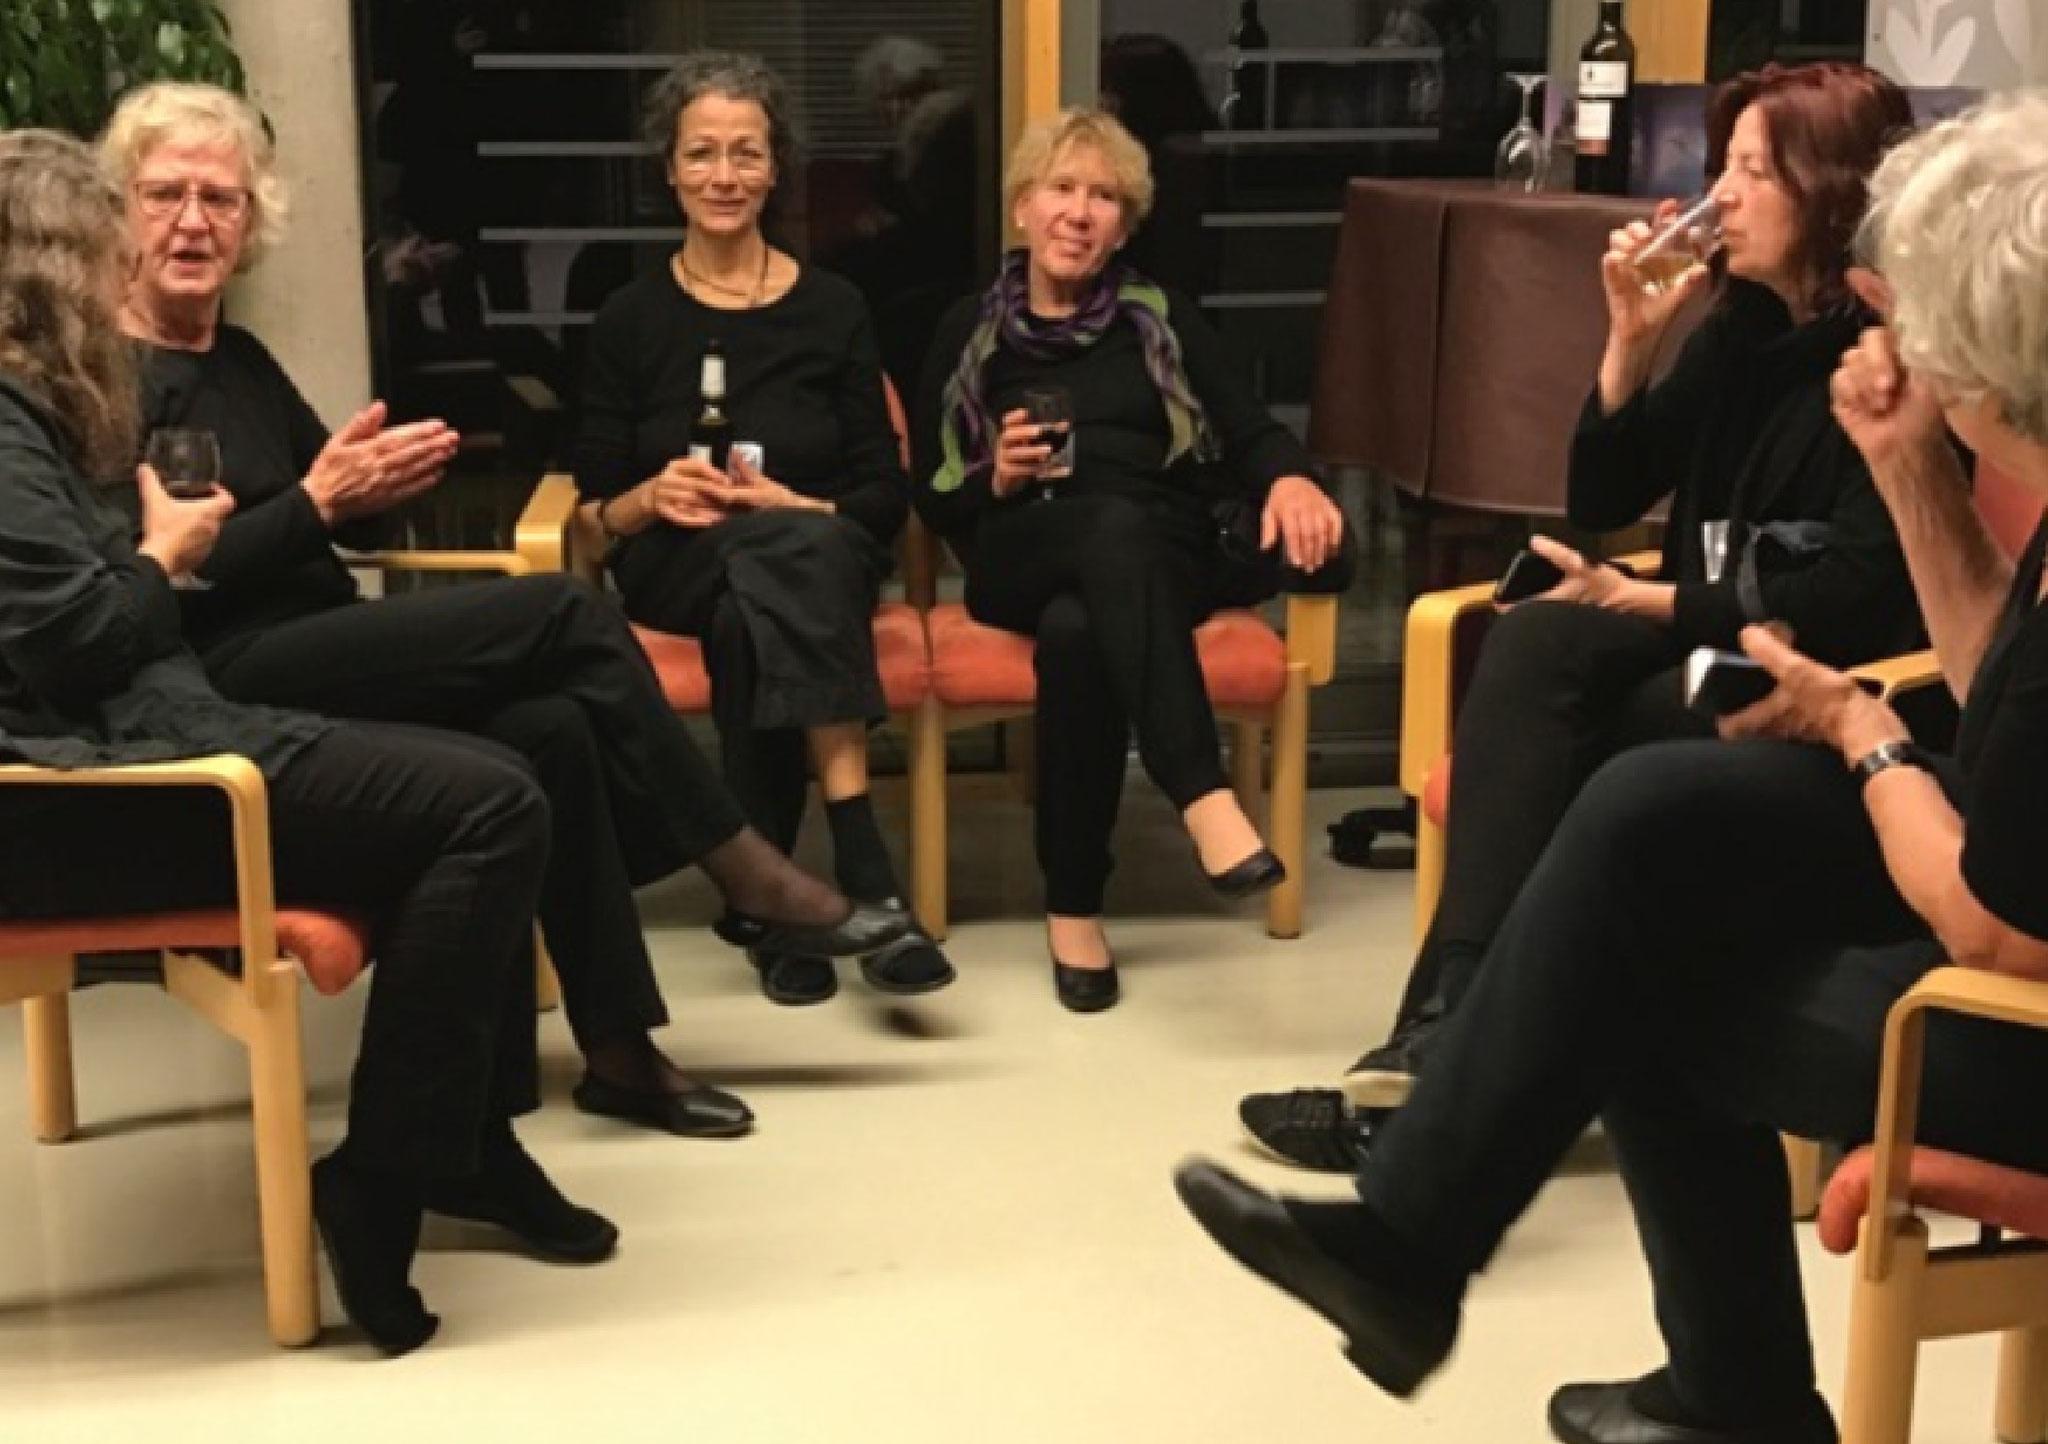 Monika Steffen (verdeckt) Elisabeth Kirberg, Catherine Cunz, Erdmute Krüger, Kerstin Horn...